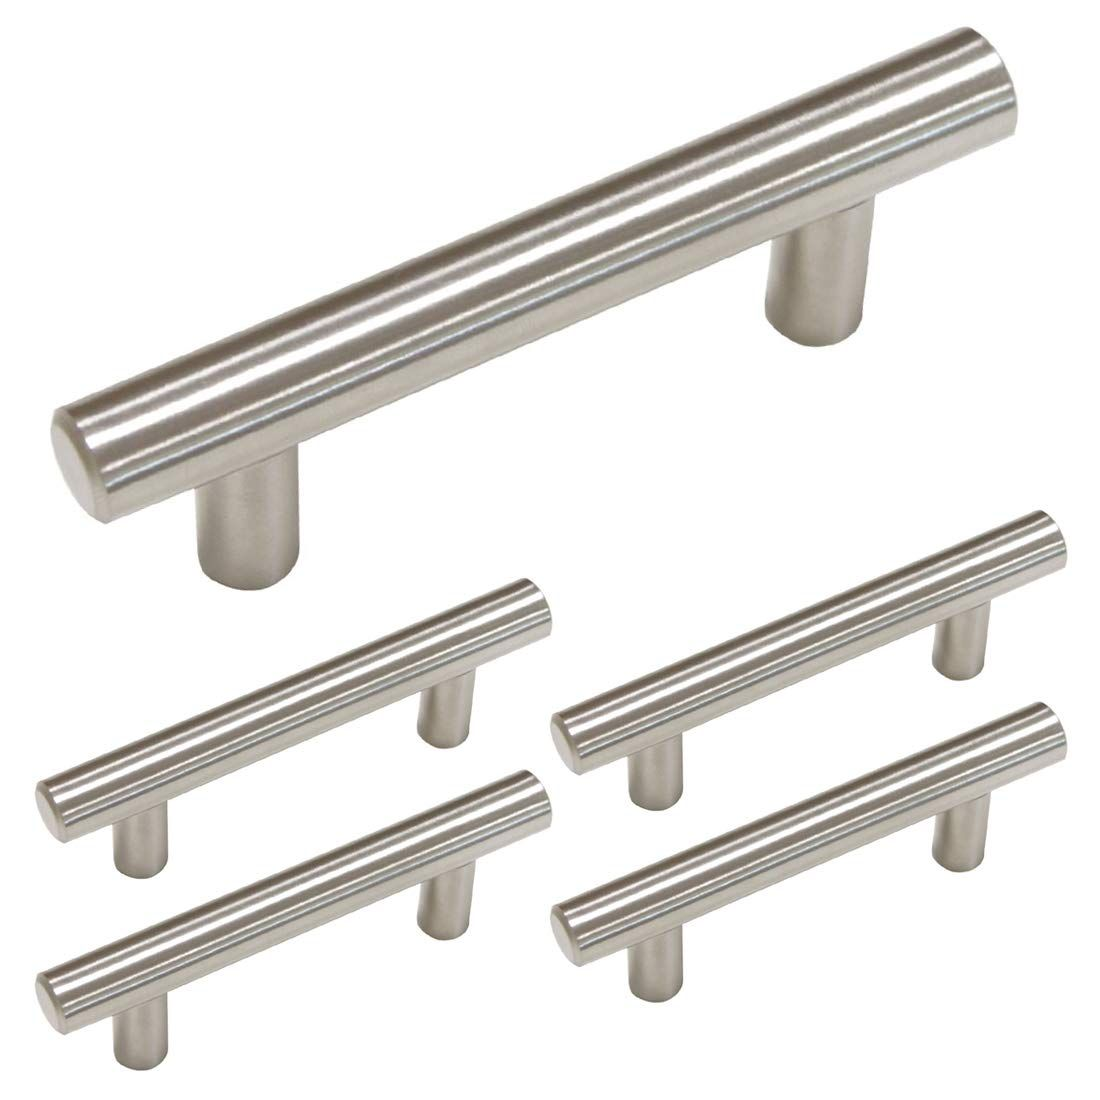 Brushed Nickel Cabinet Handles Drawer Pulls 3 In Hole Centers Cabinet Hardwa Cabinet Hardware Brushed Nickel Brushed Nickel Drawer Pulls Kitchen Drawer Handles